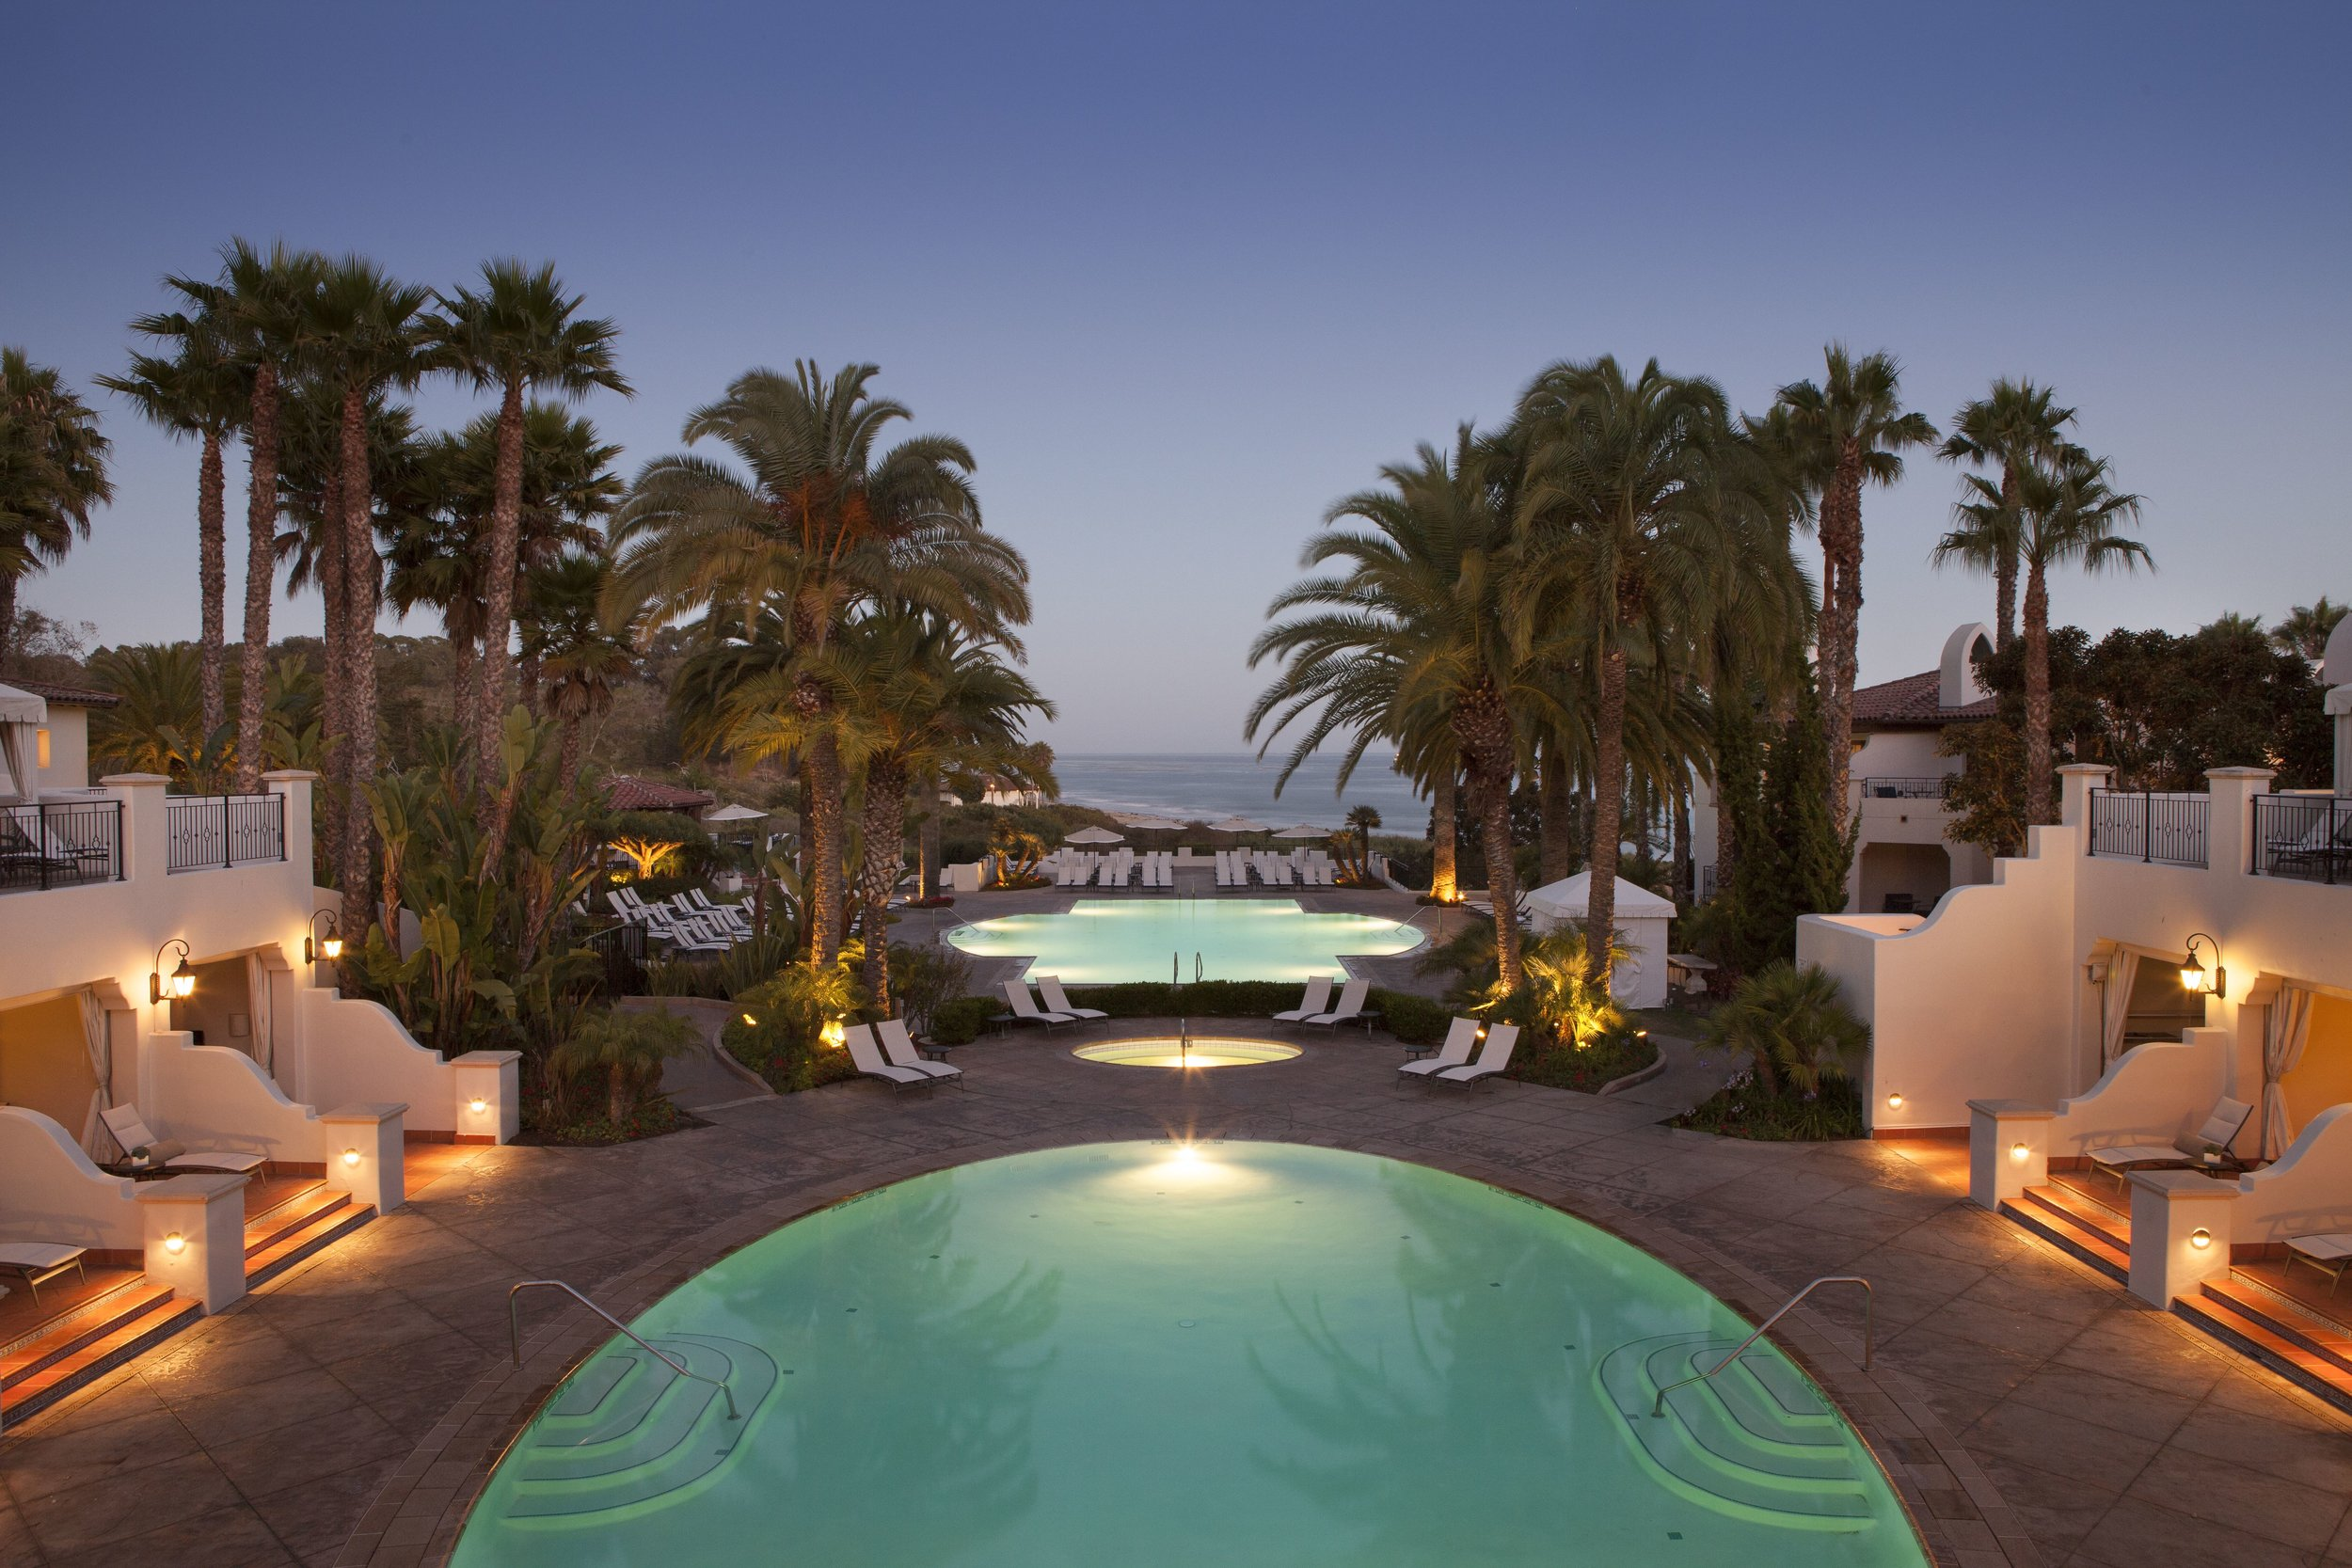 Resort Pool Sunset - The Ritz-Carlton Bacara, Santa Barbara.jpg